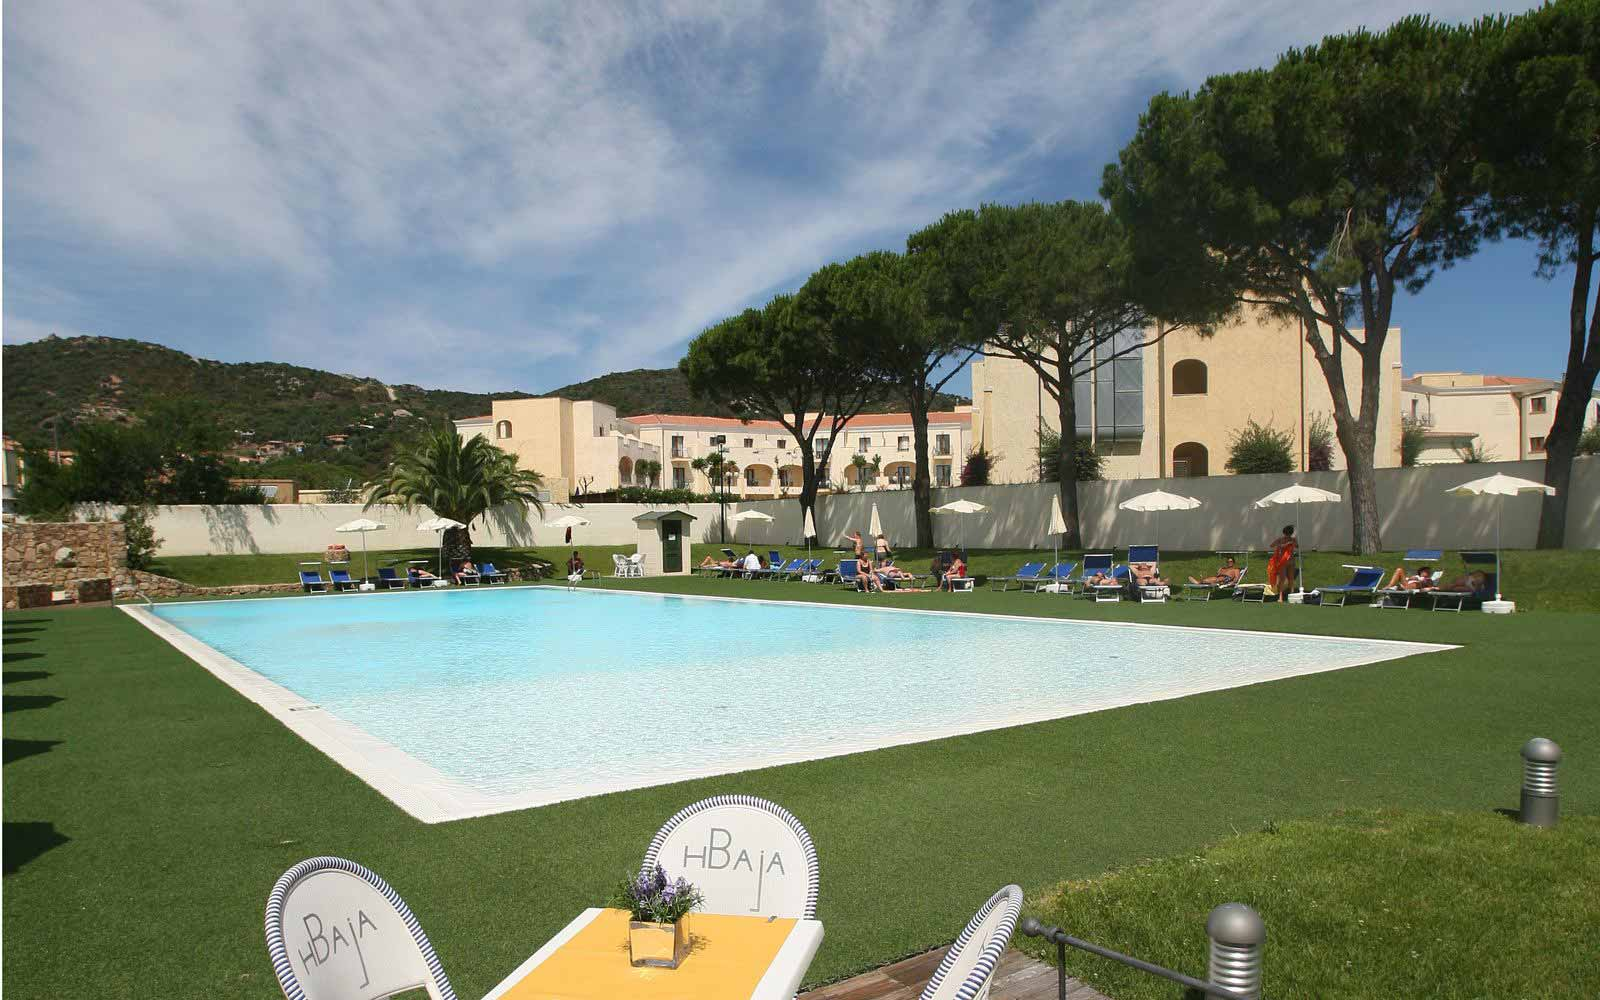 Around the pool at Hotel Baja